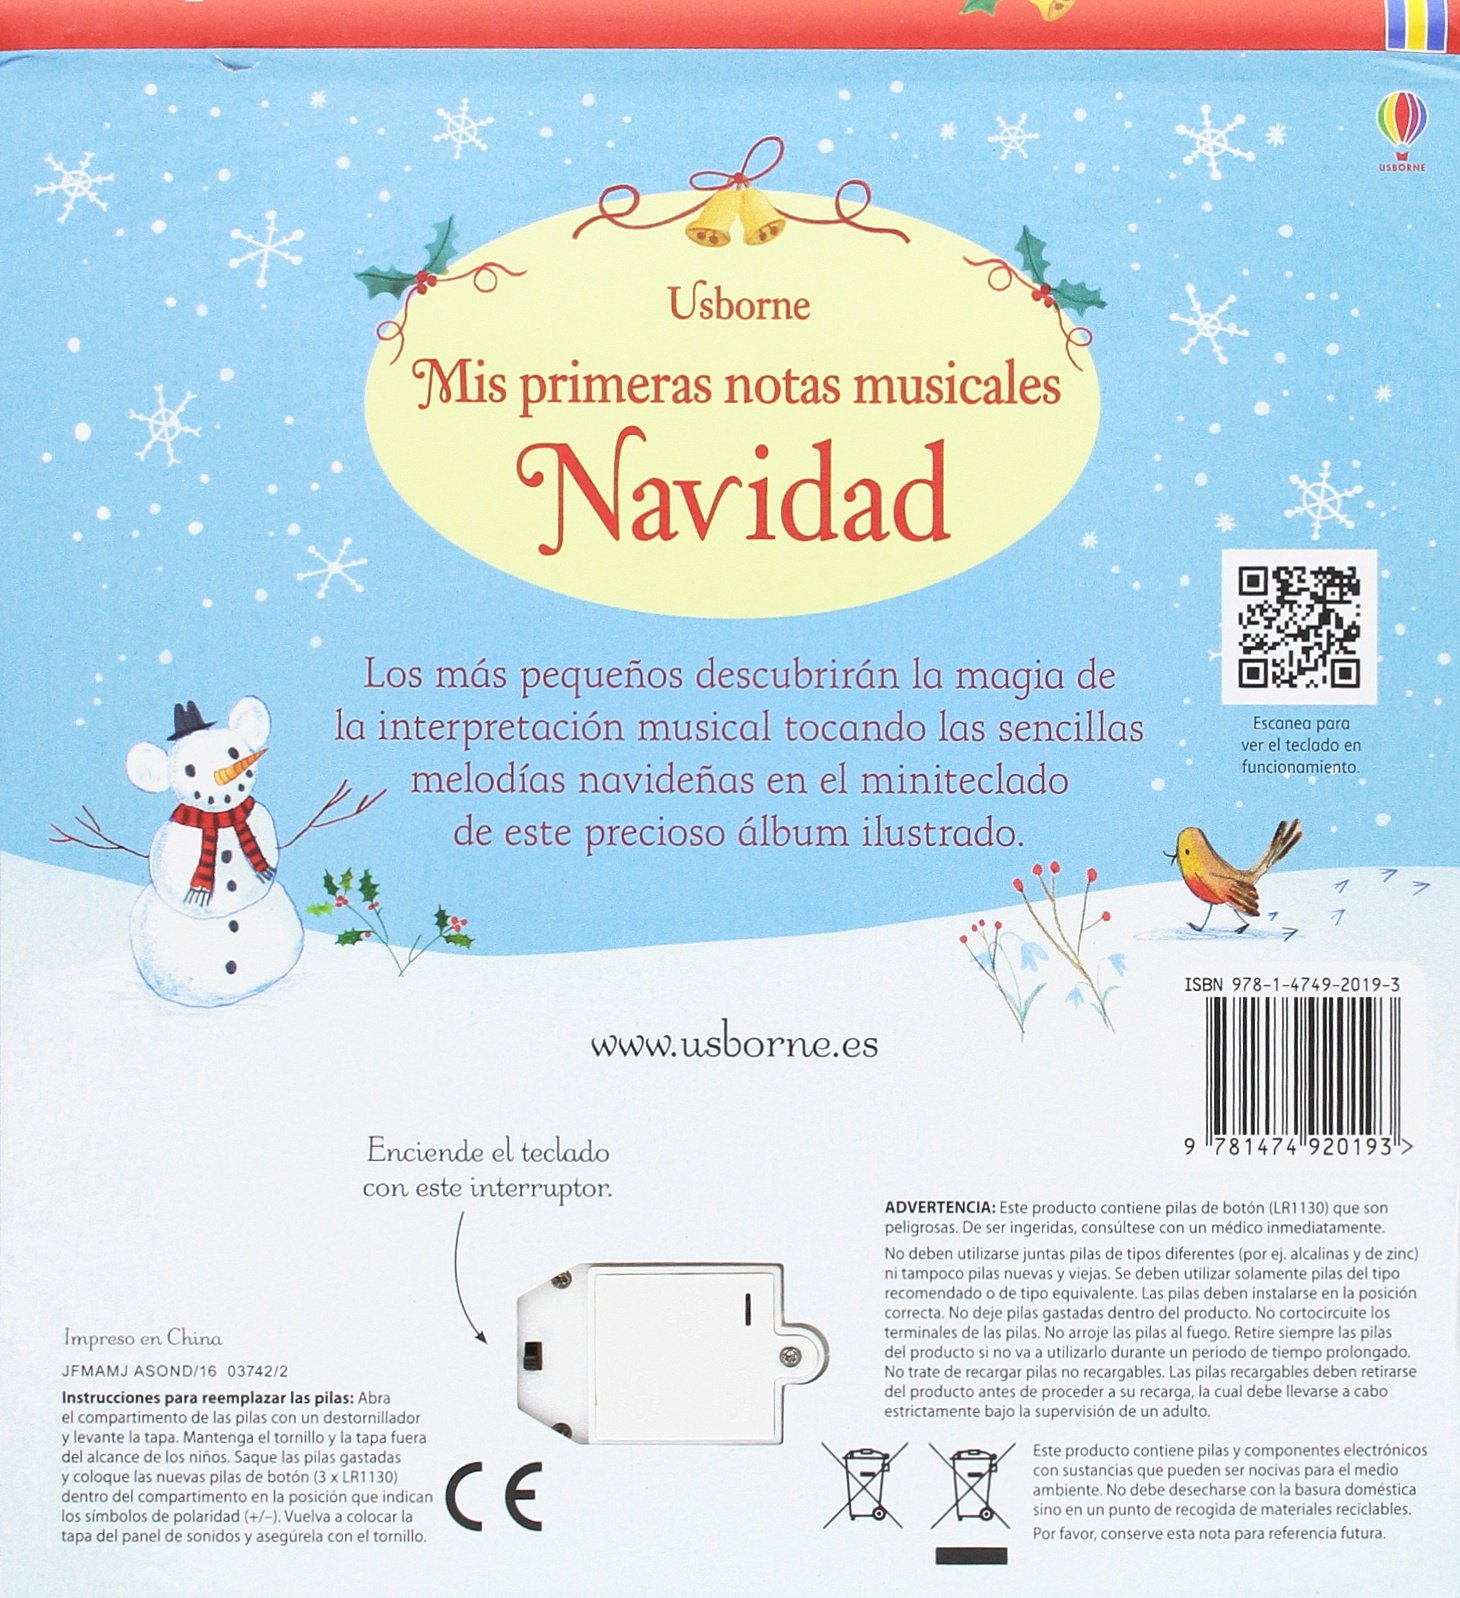 Mis primeras notas musicales. Navidad: USBORNE: 9781474920193: Amazon.com: Books